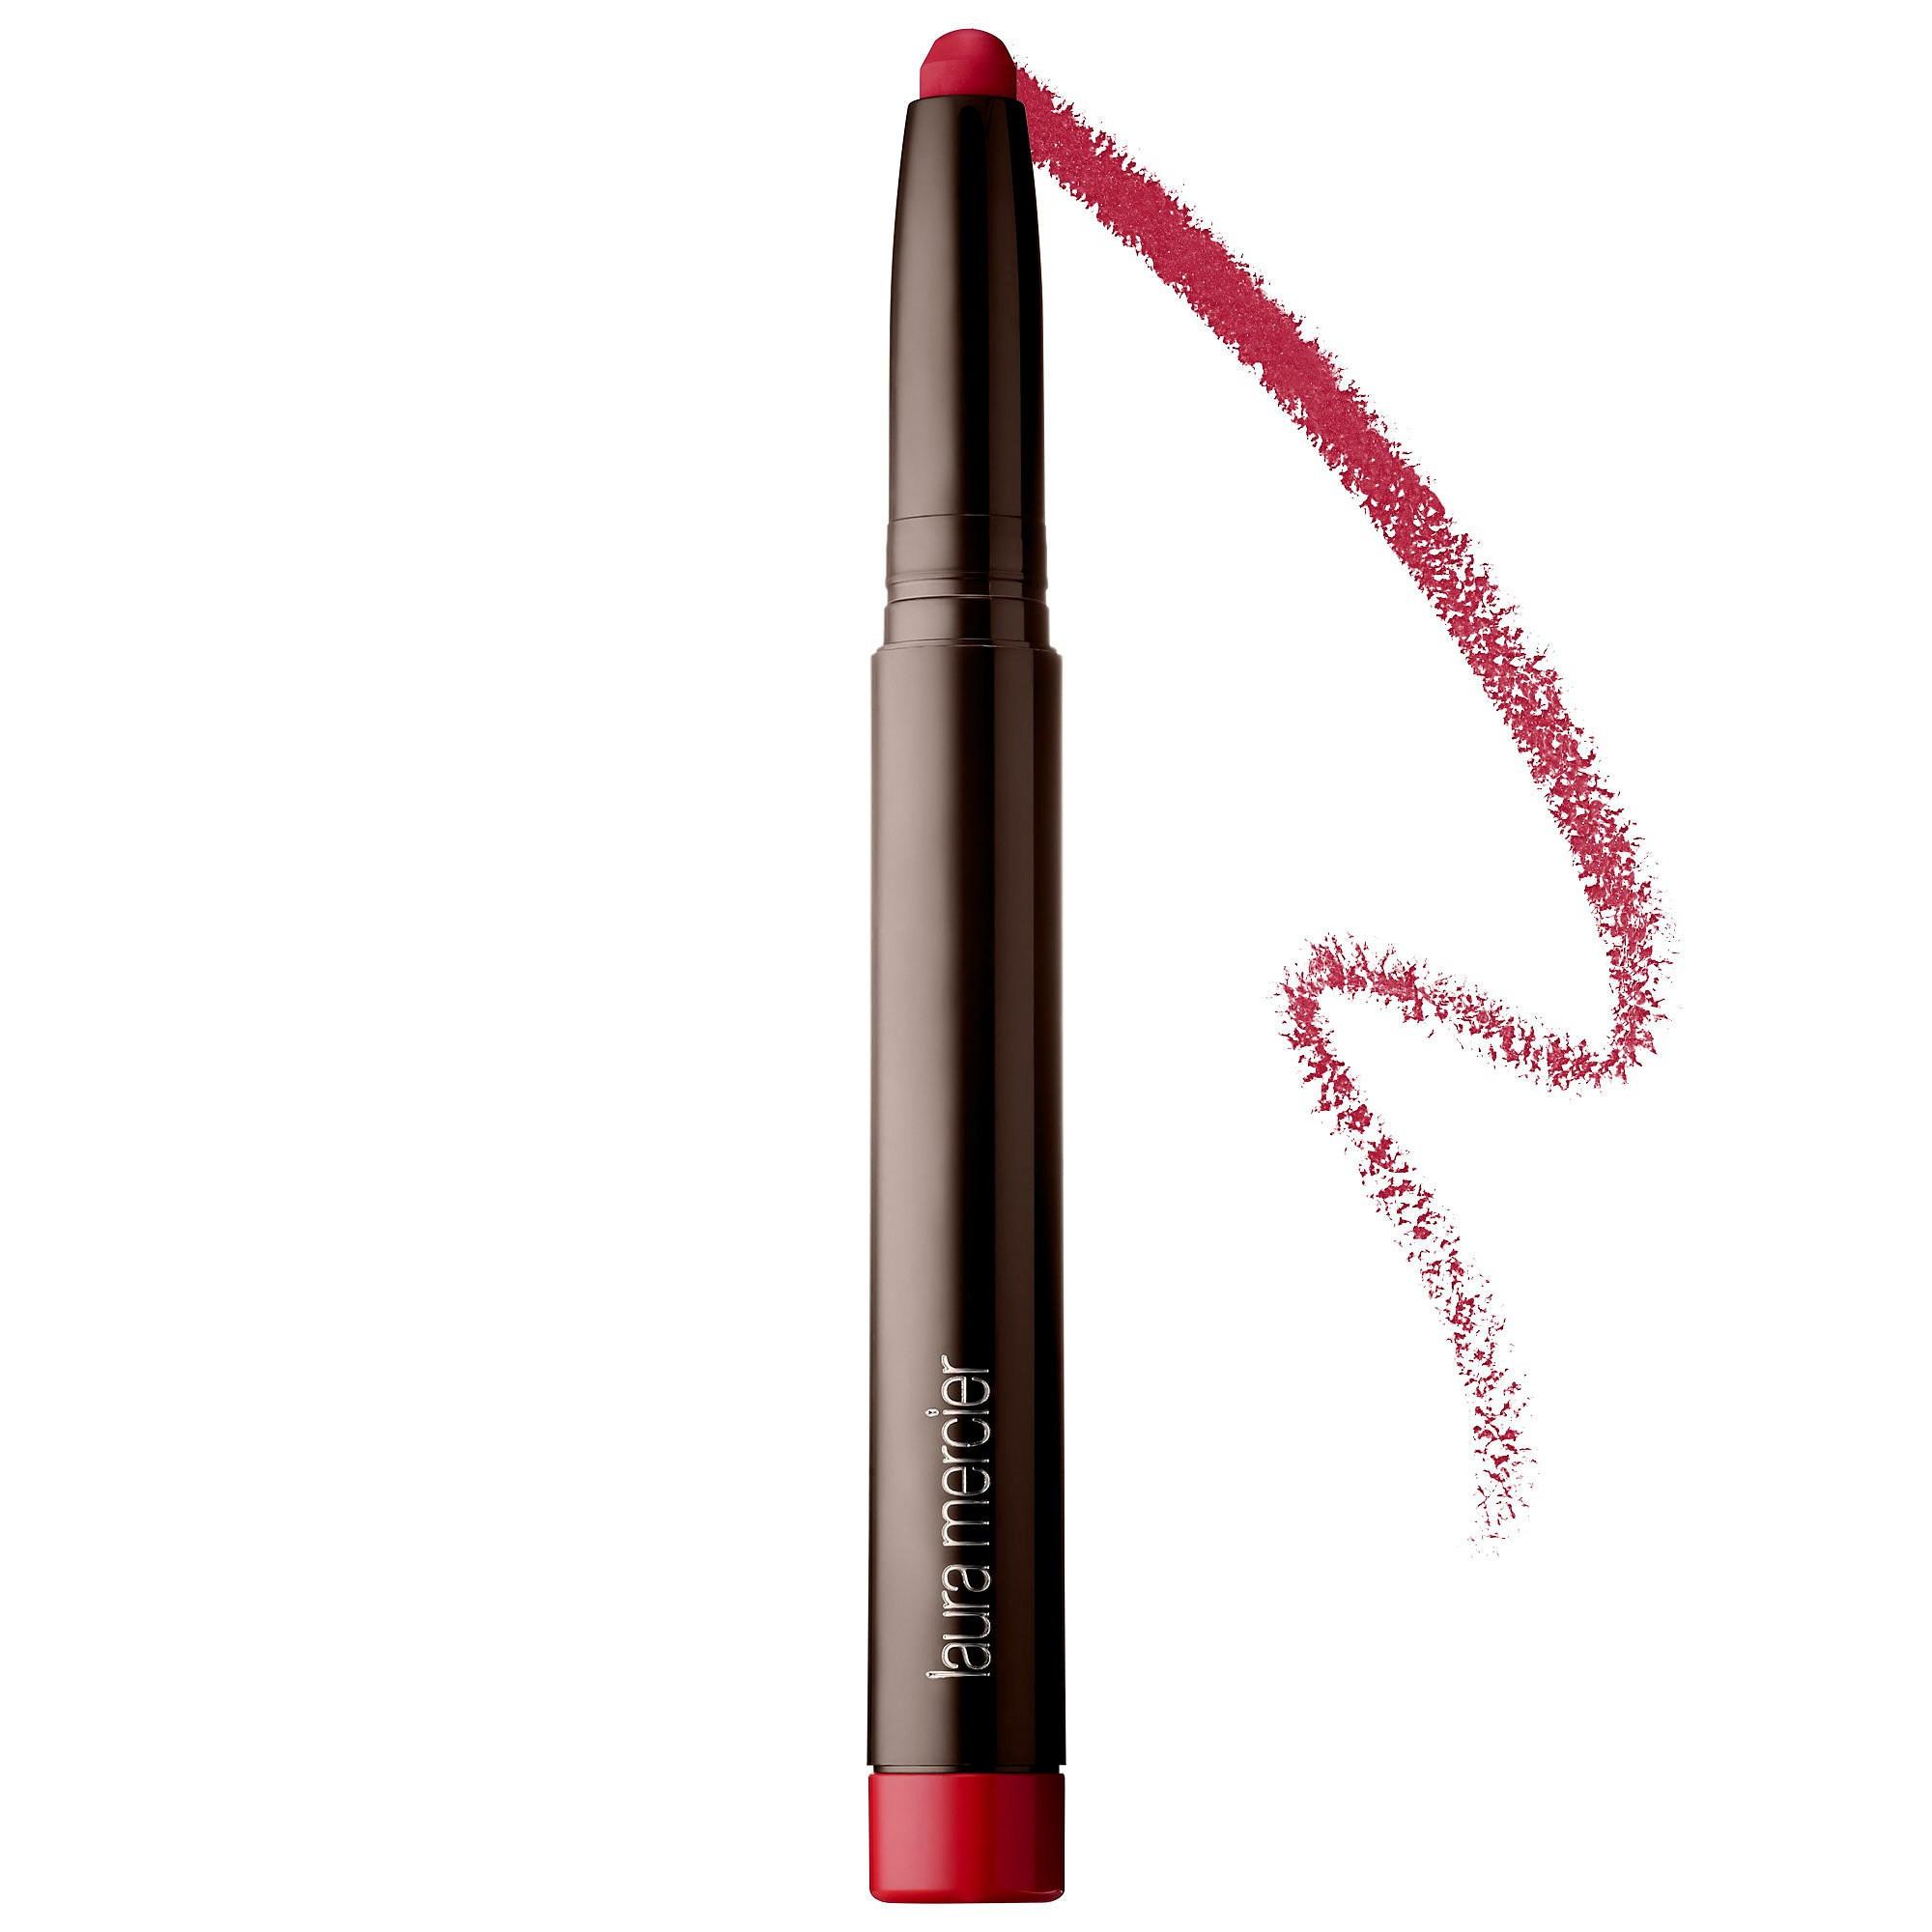 Laura Mercier Velour Extreme Matte Lipstick Power